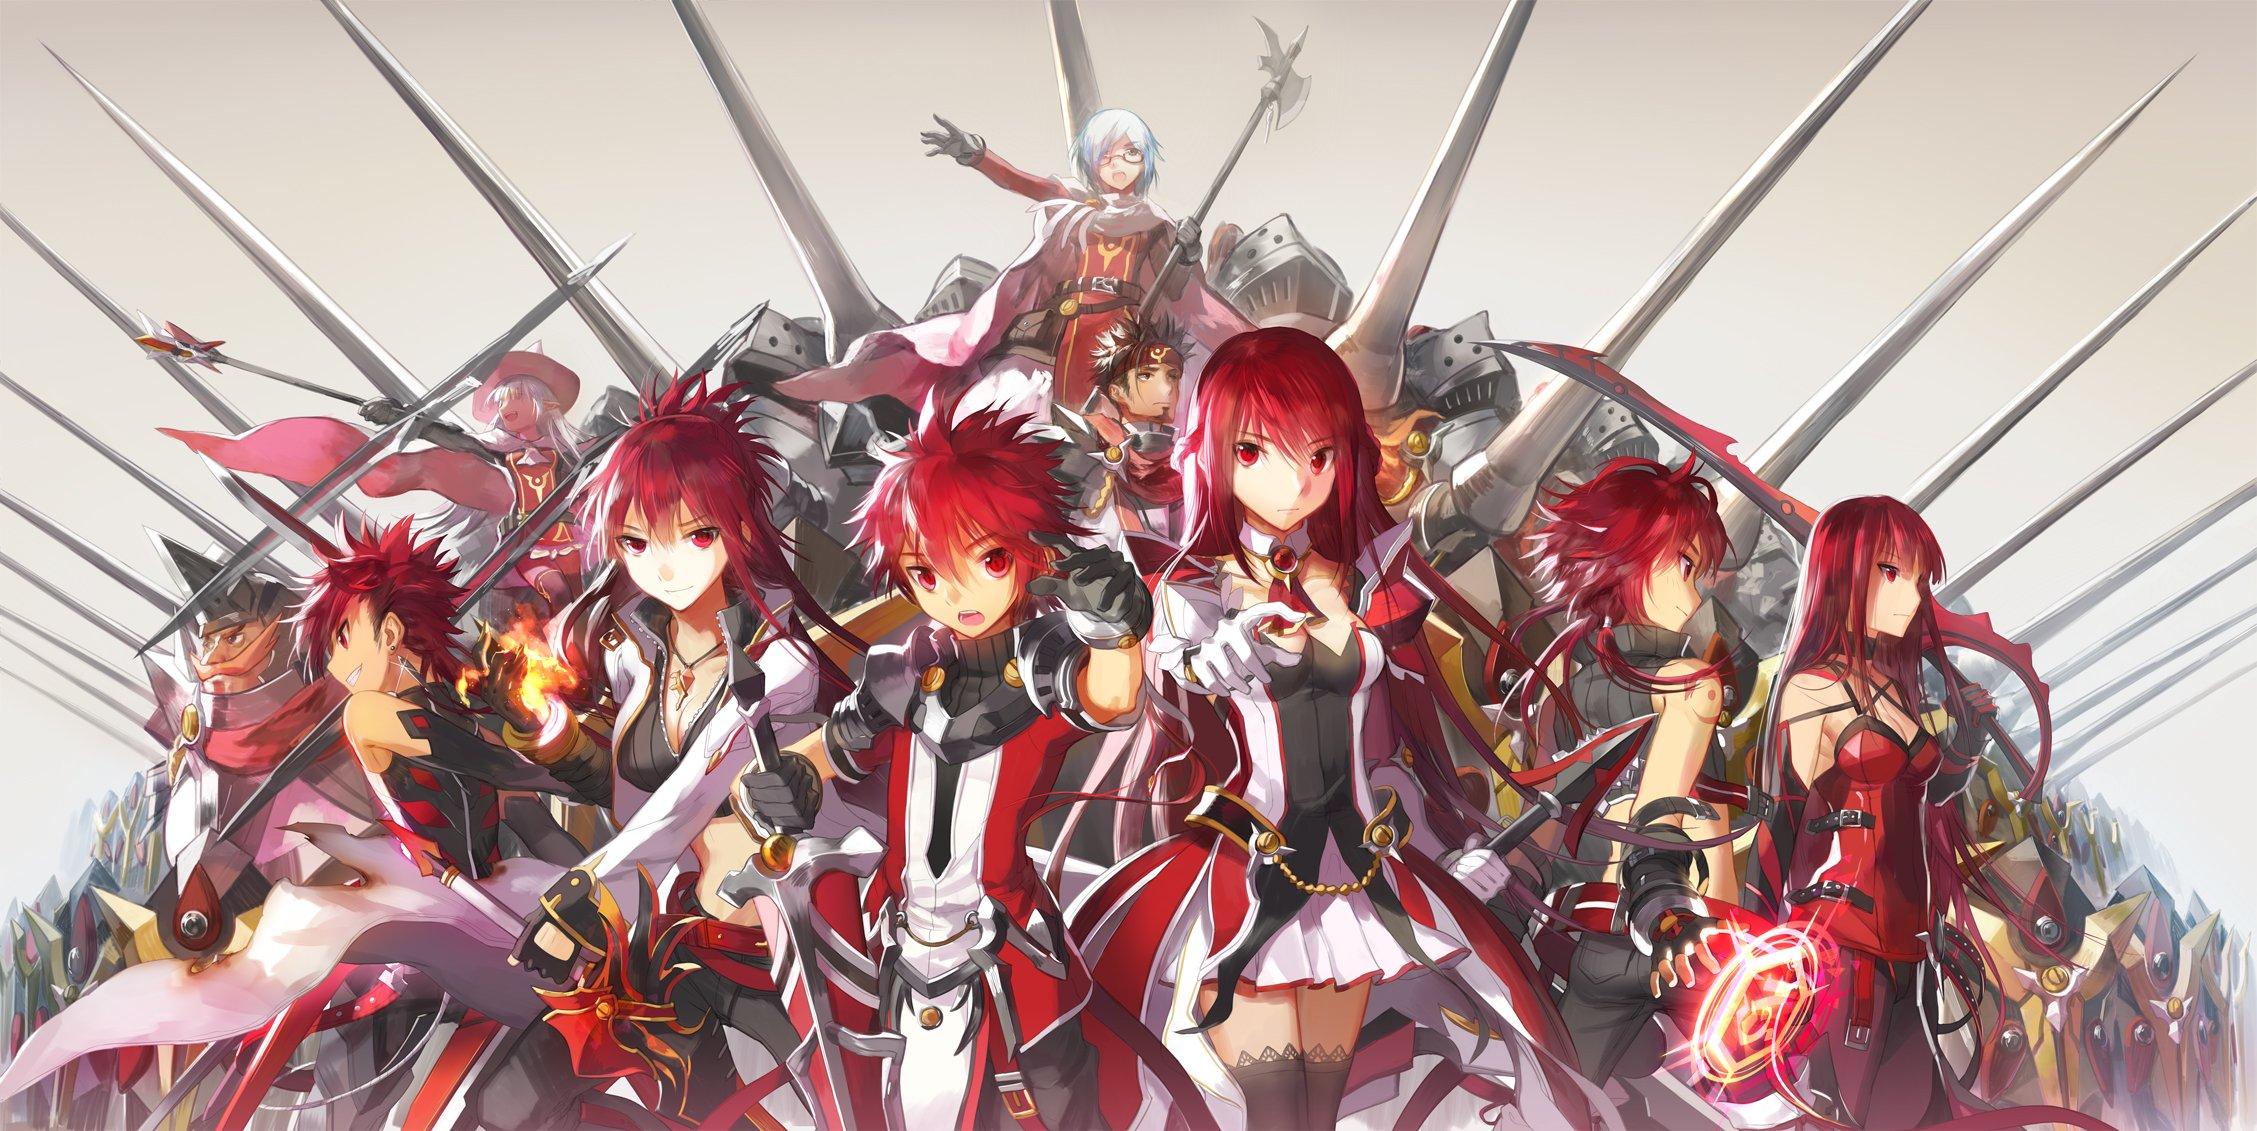 elesis elsword elsword elsword character magic red eyes red hair 2257x1131